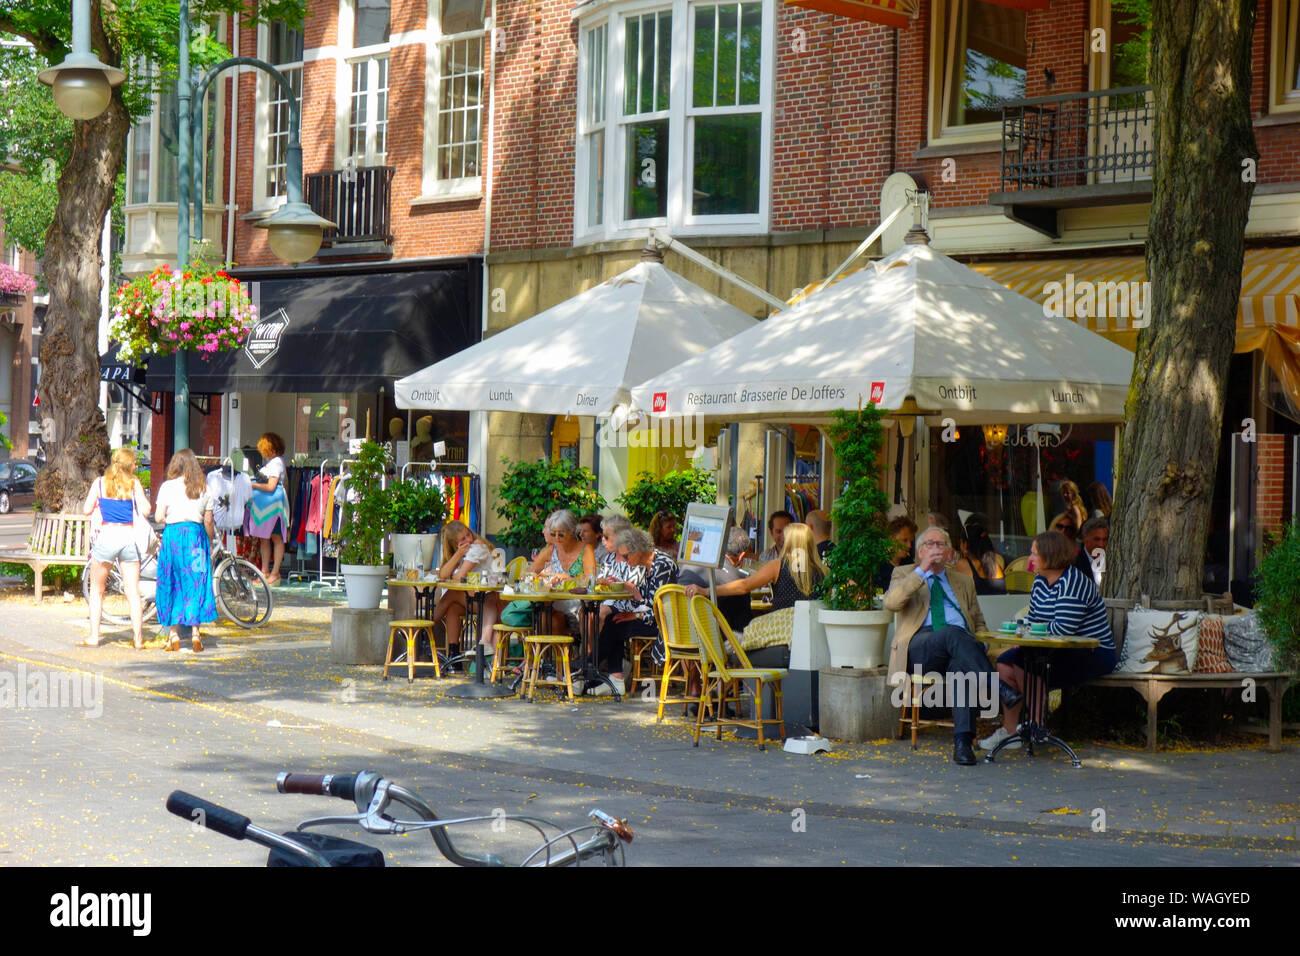 Cornelis Schuytstraat, Oud Zuid, Amsterdam, Paesi Bassi - home per una vasta varietà di ristoranti e caffetterie, high-end di boutique e negozi di bellezza. Foto Stock